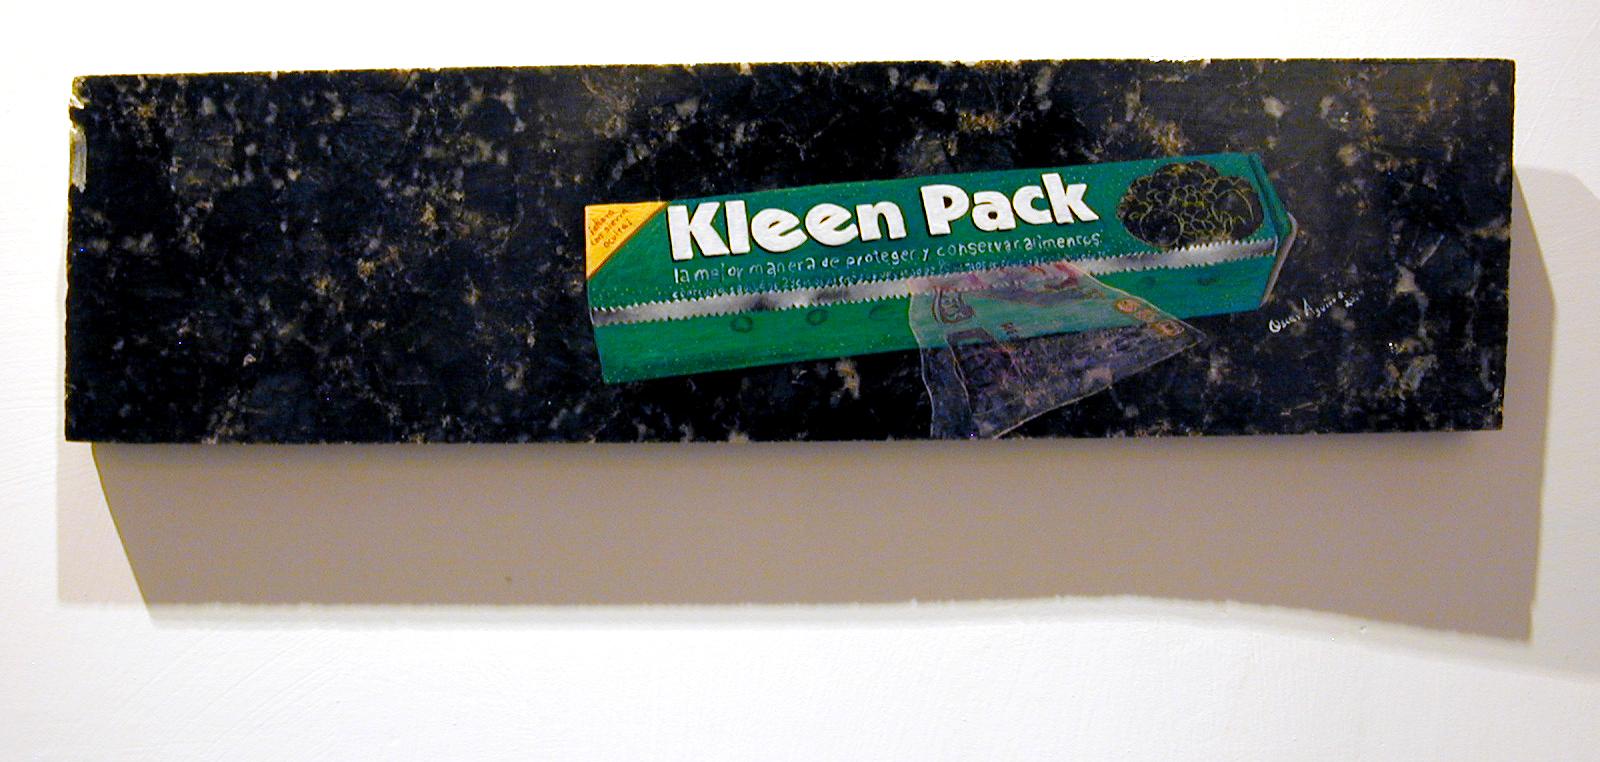 Kleenpack-a.jpg